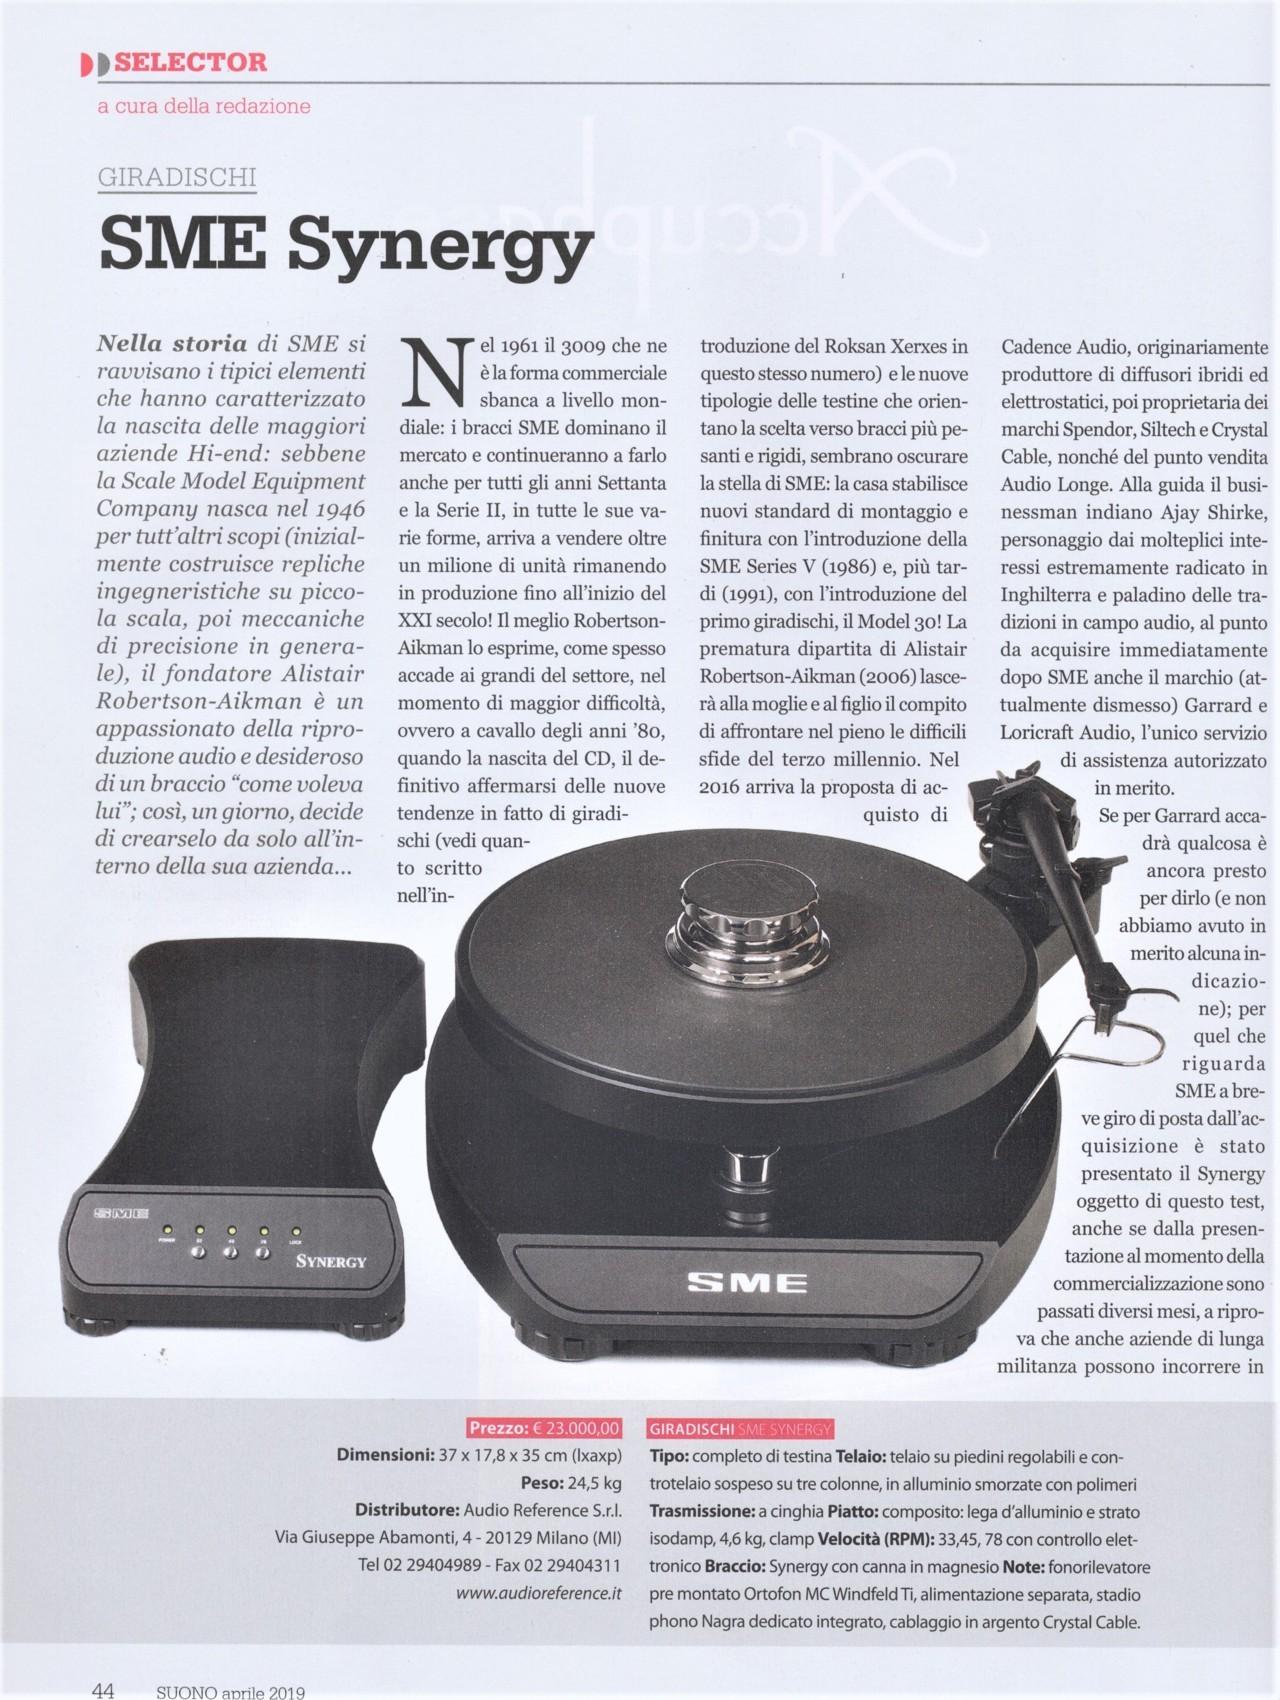 SME Synergy – giradischi con testina e prephono